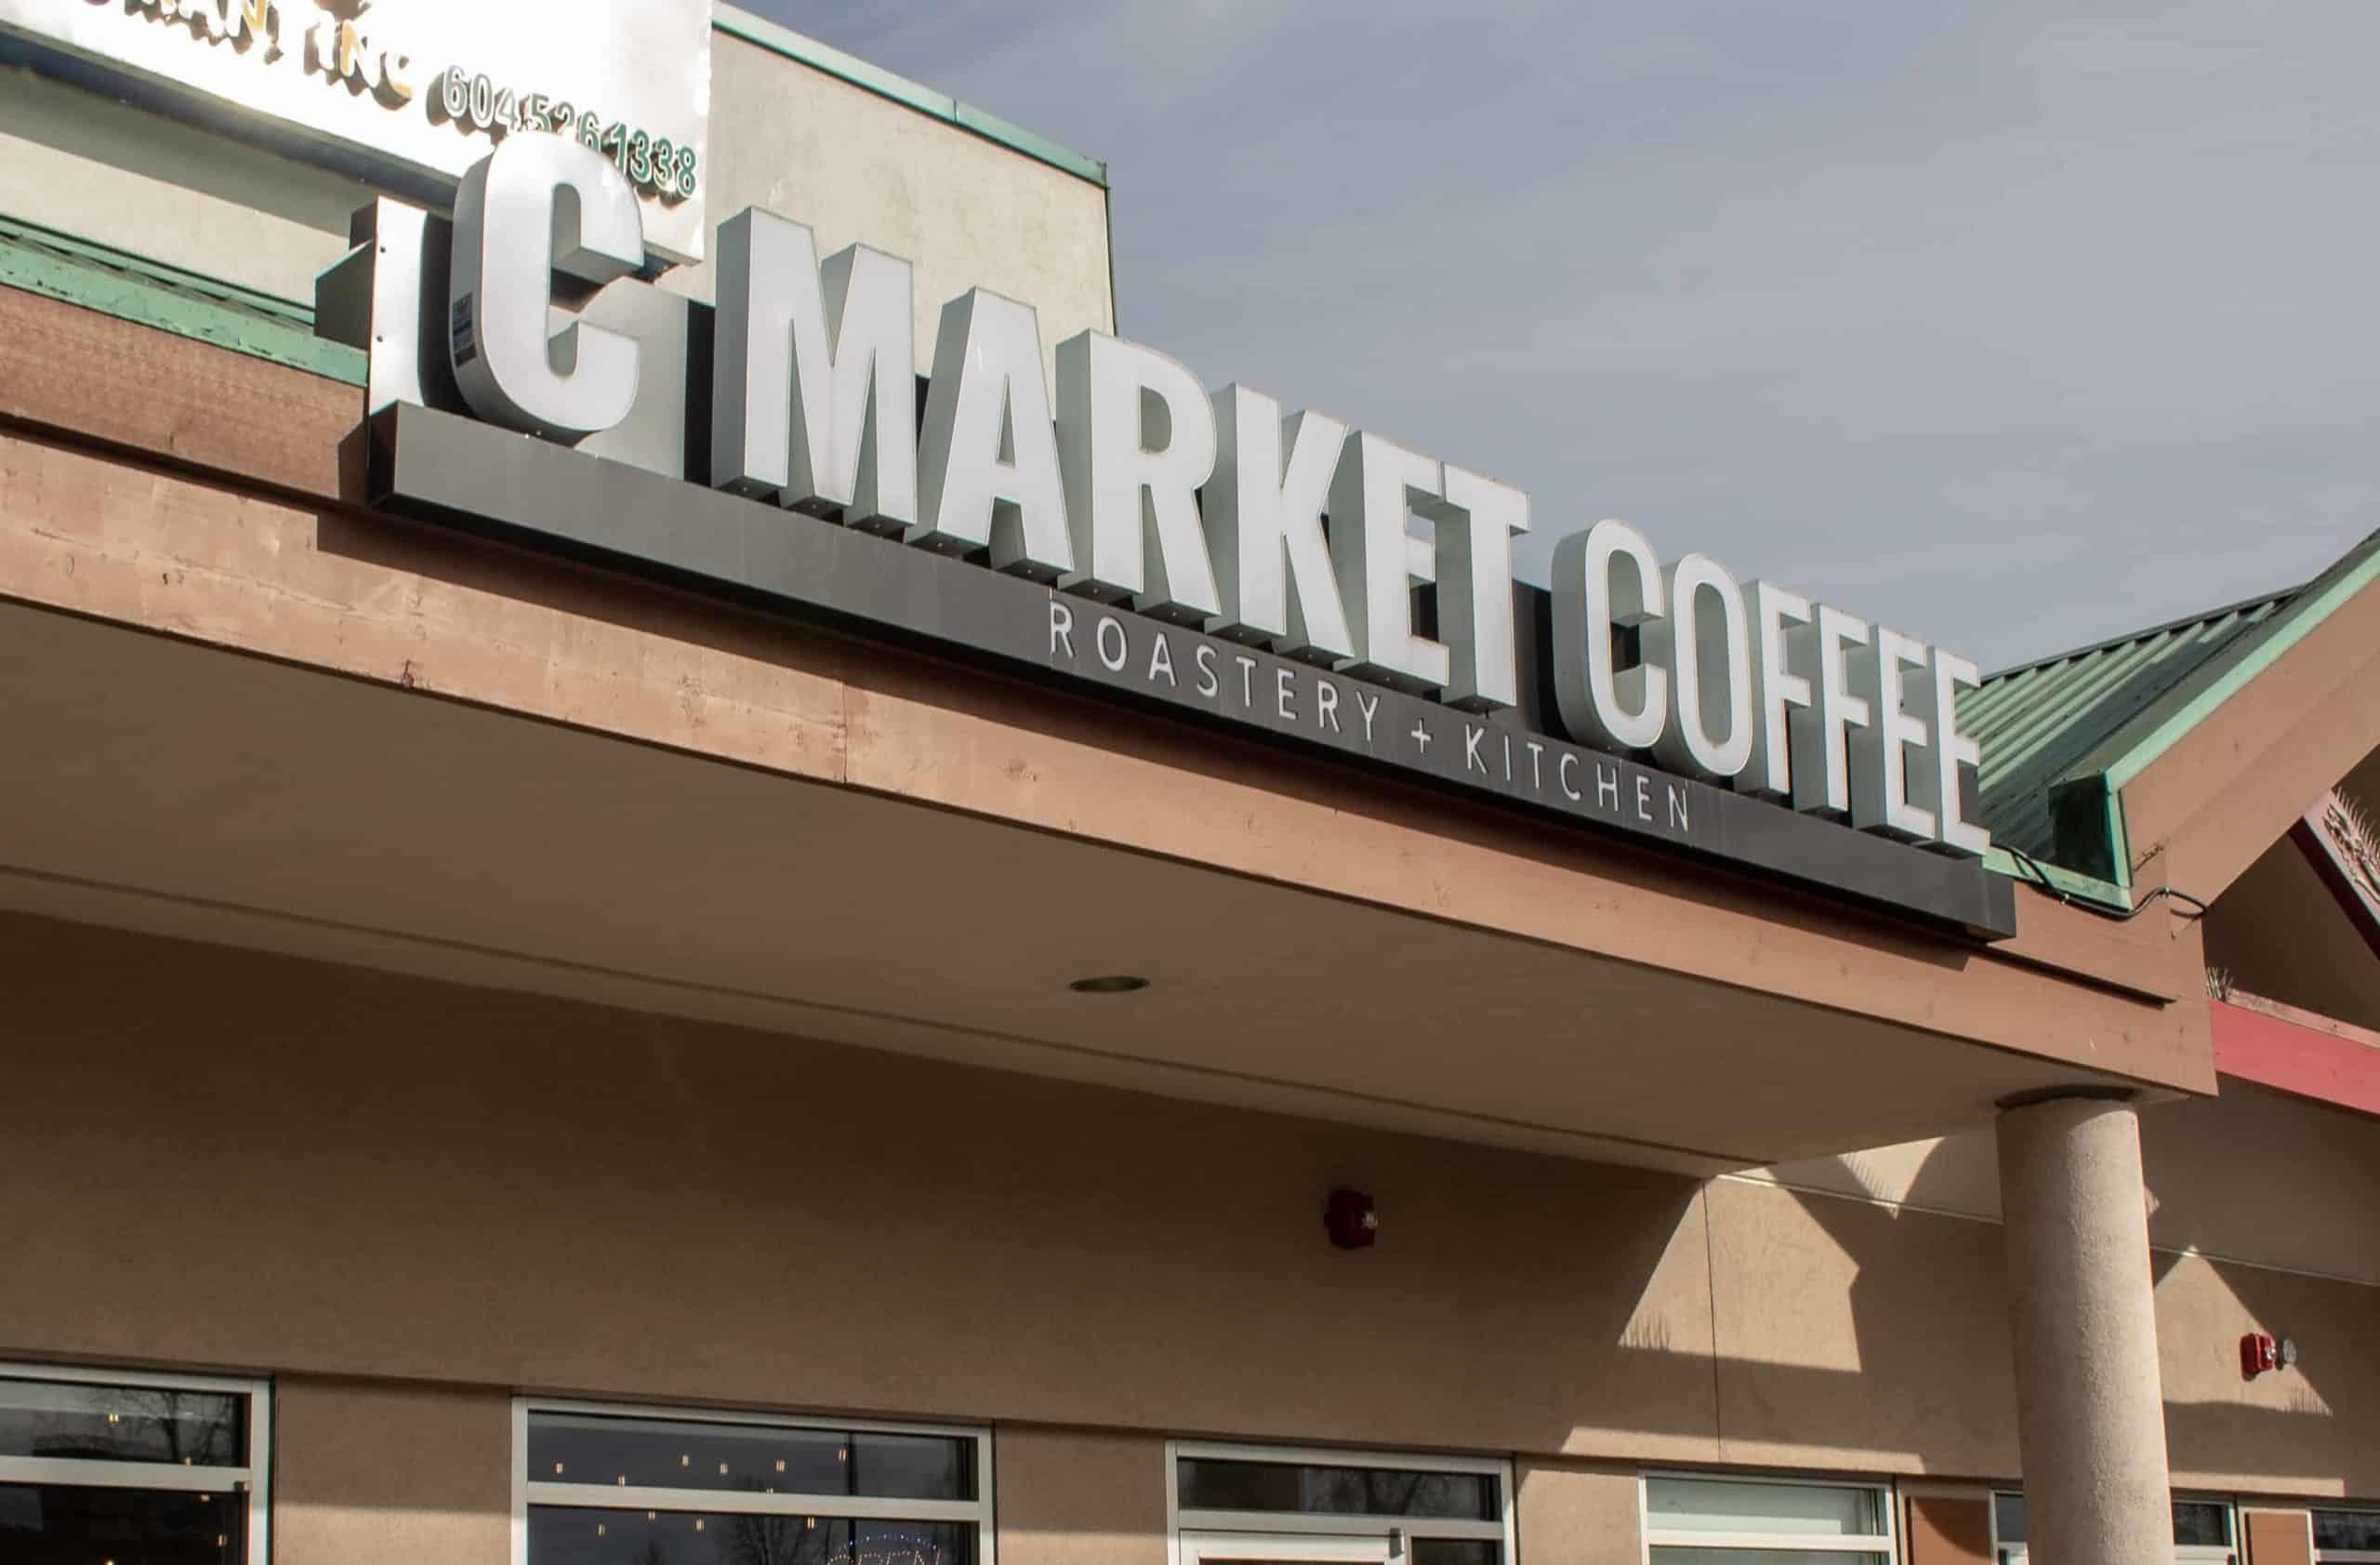 Outside of CMarket Coffee